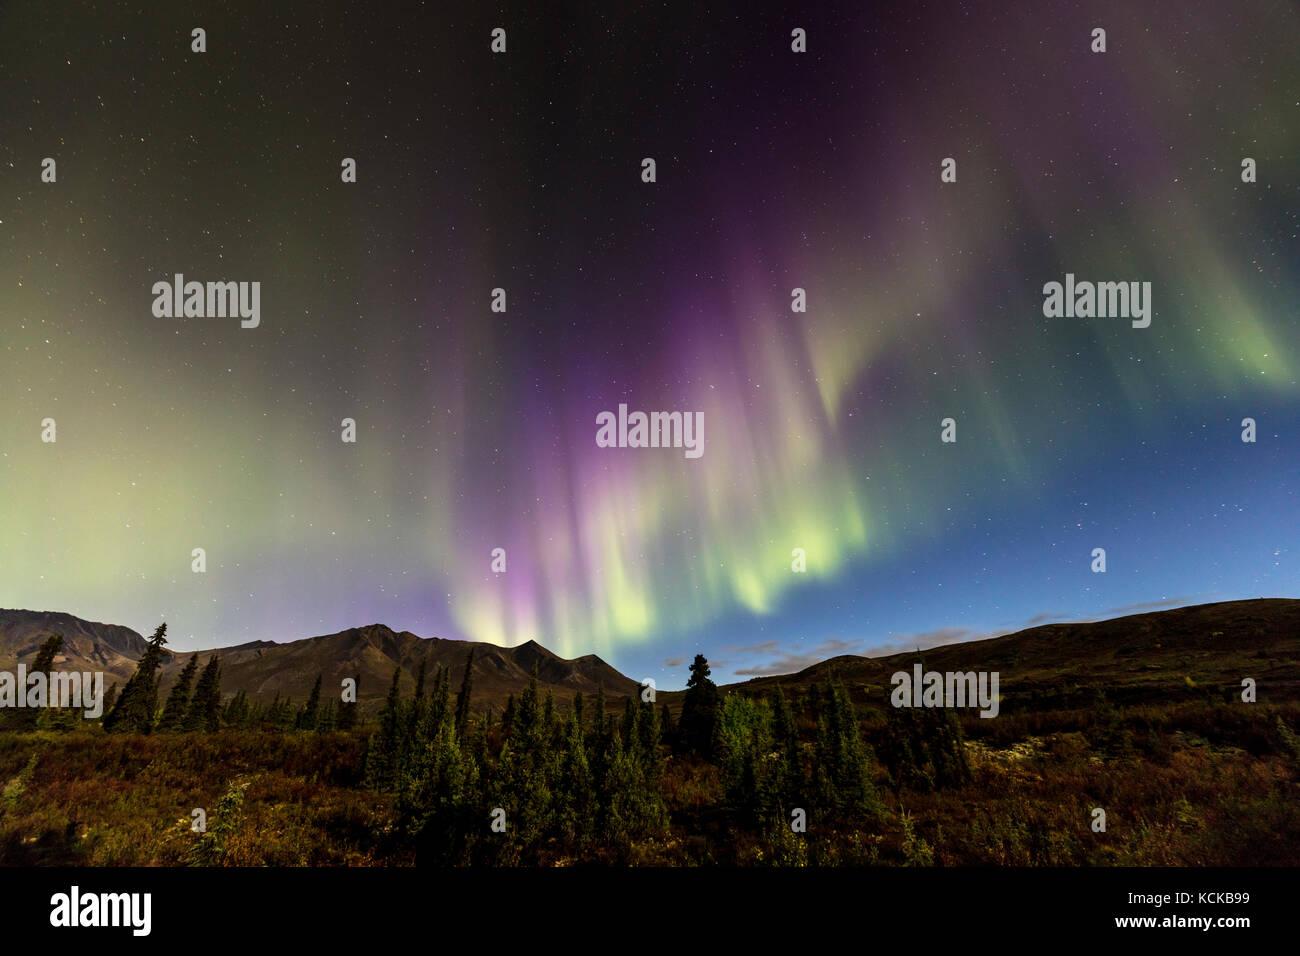 Northern Lights or Aurora Borealis over Tombstone Territorial Park, Yukon, Canada - Stock Image